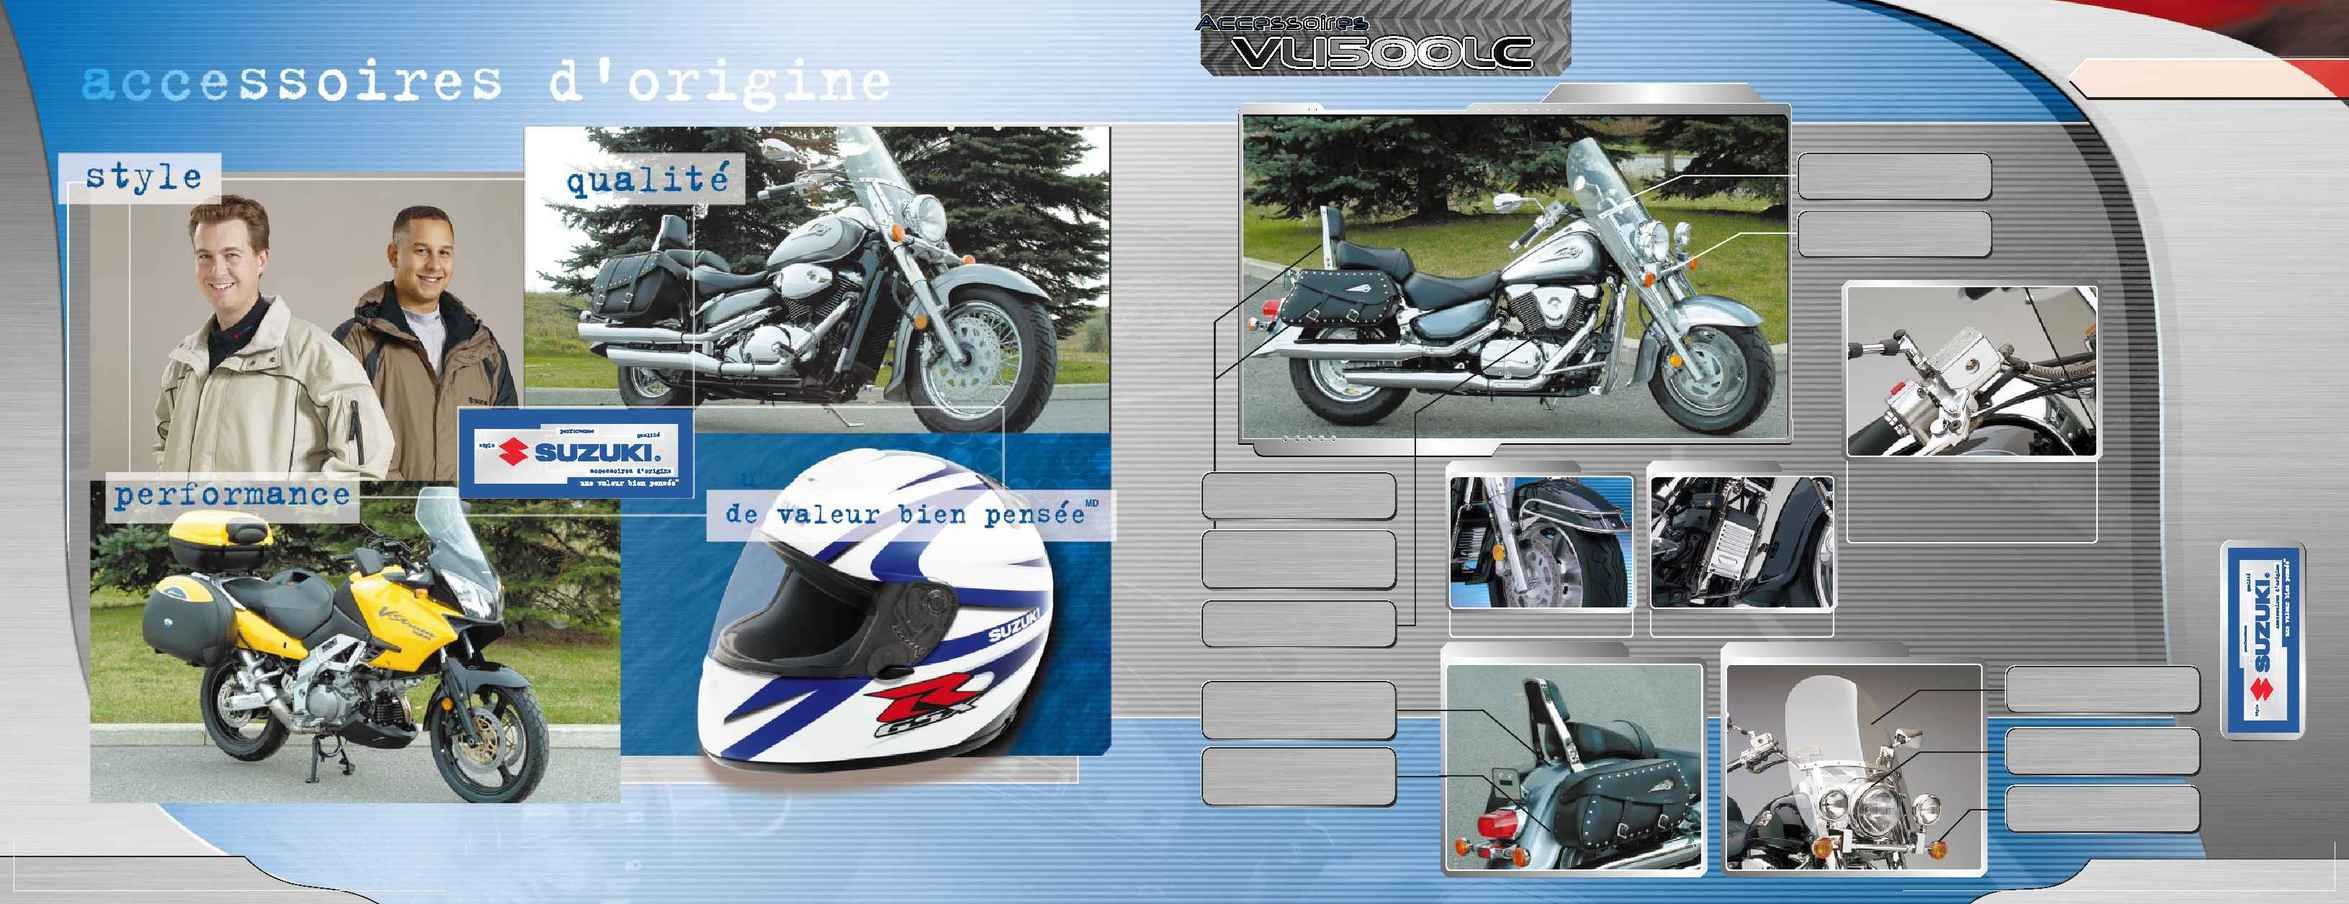 Suzuki - 2003 mc Access brochure F